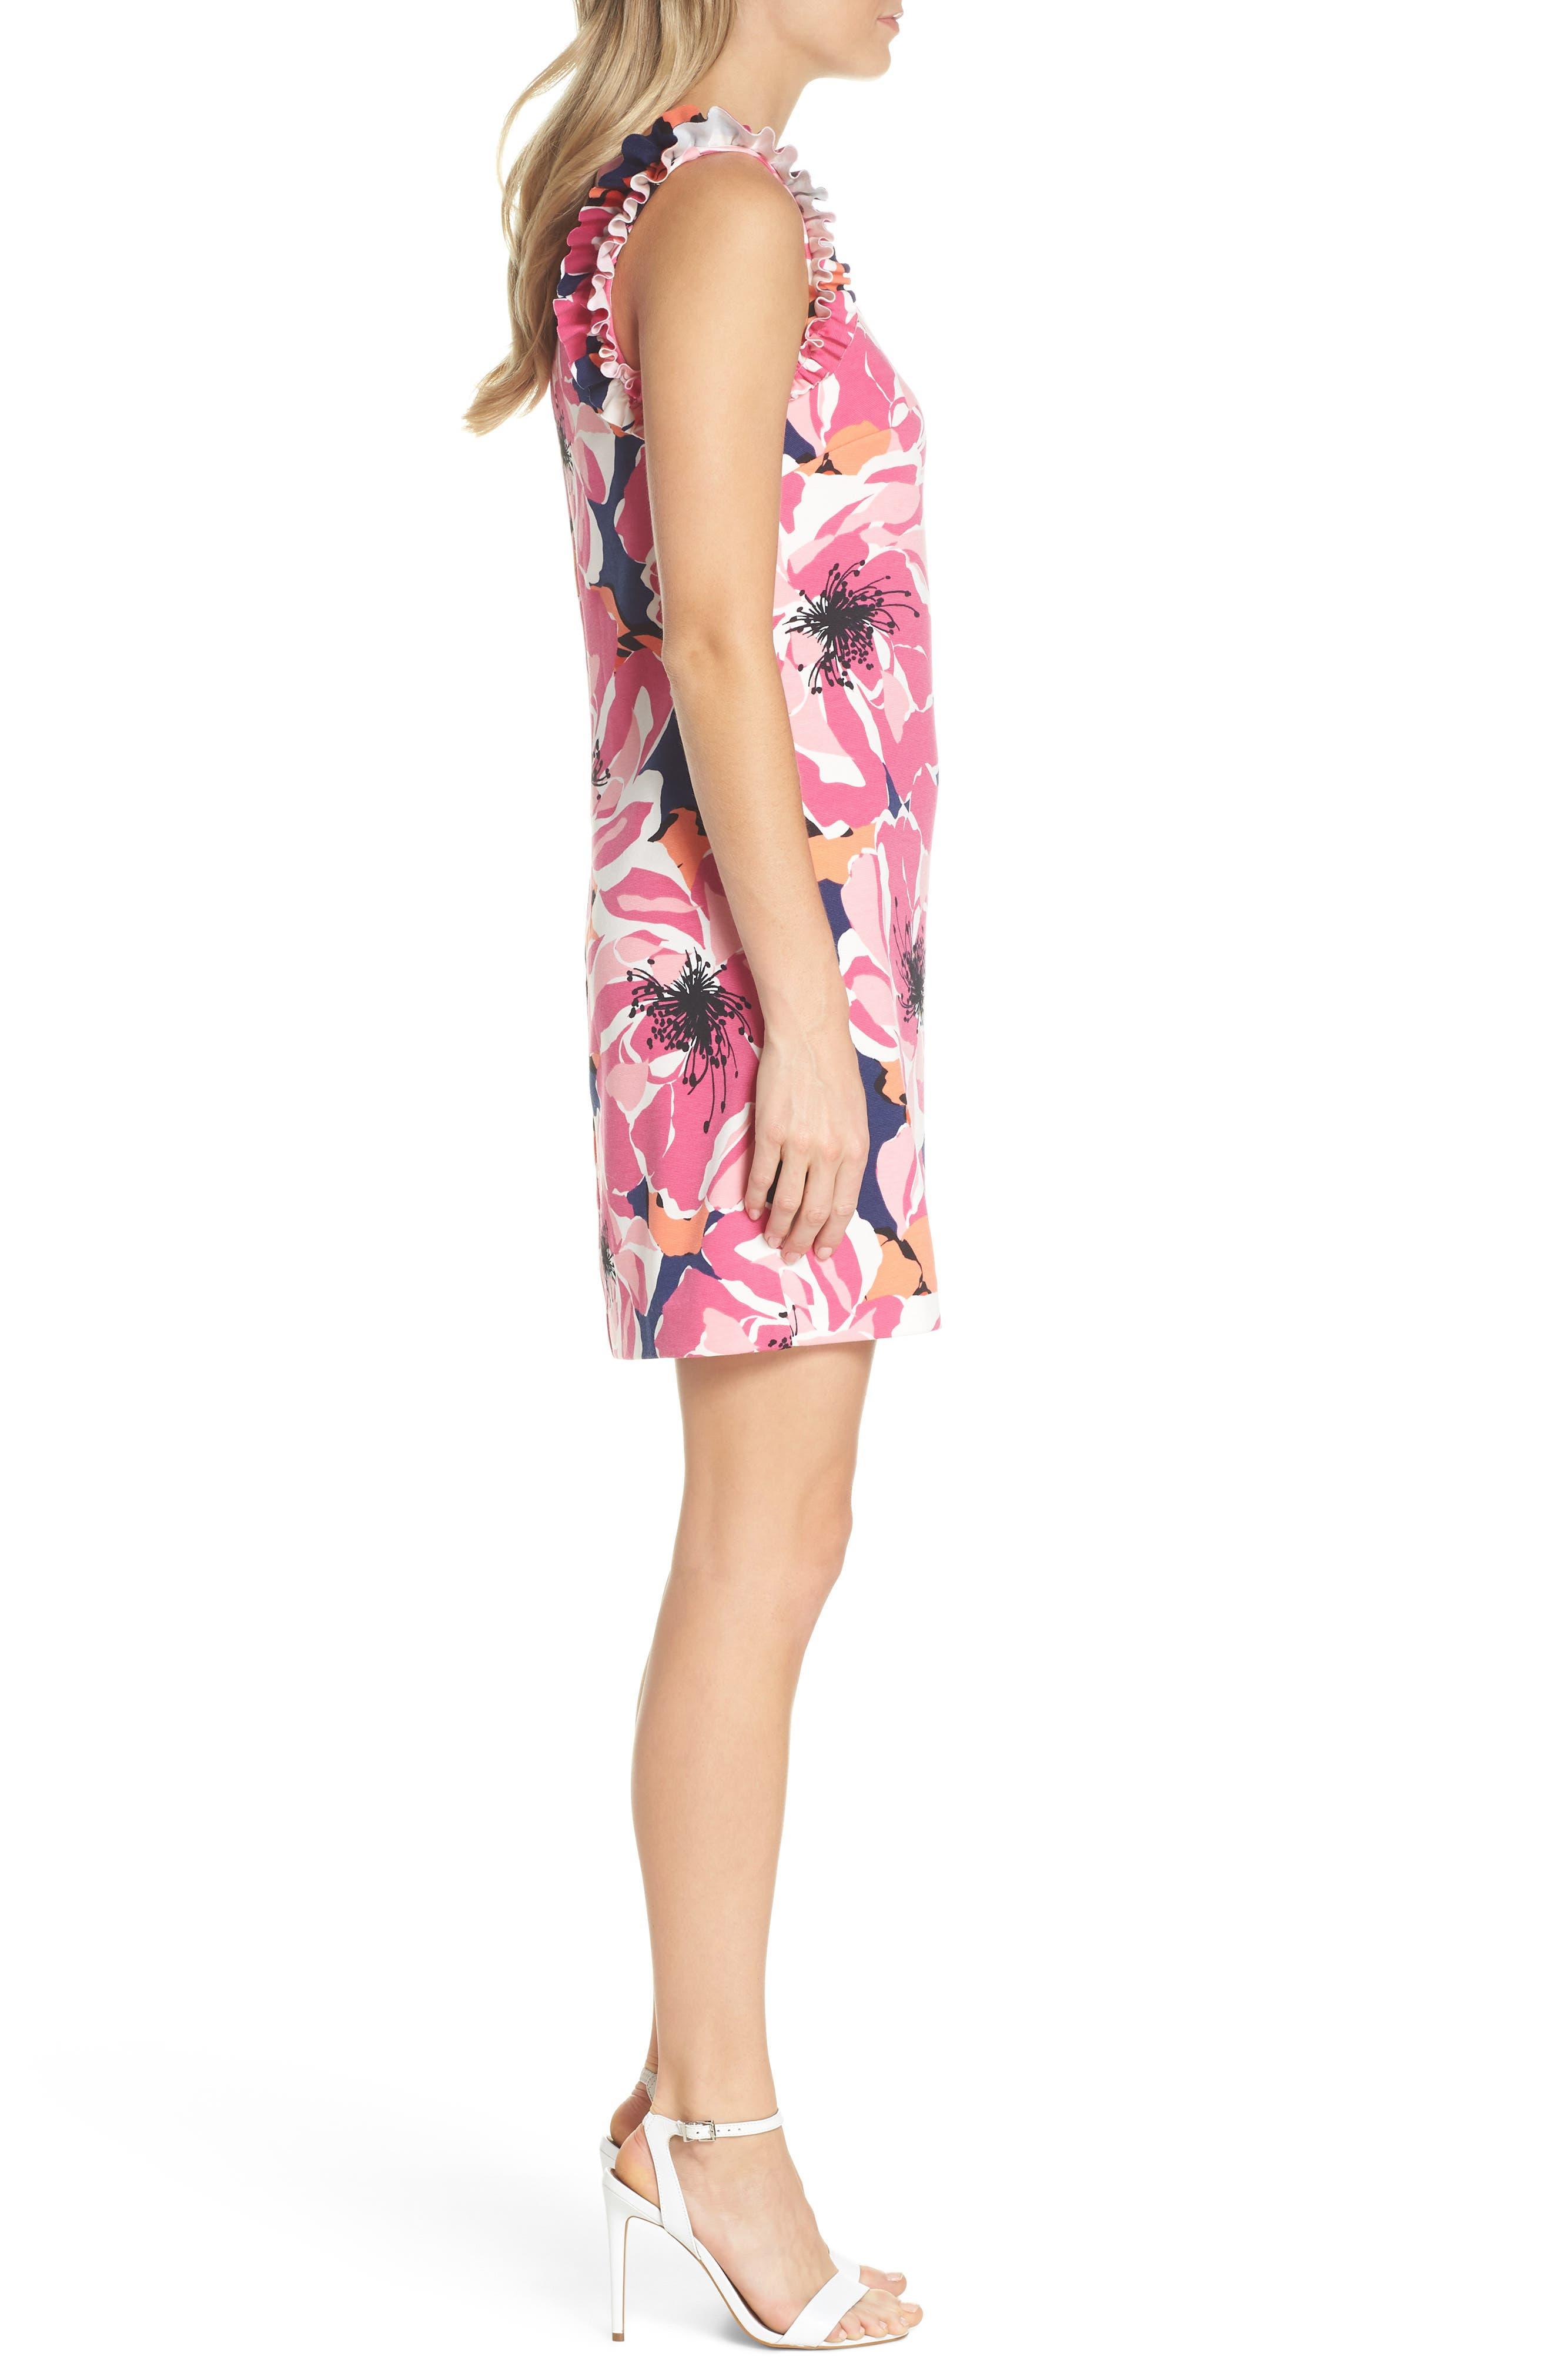 TRINA TRINA TURK,                             Sirena Ruffle Sheath Dress,                             Alternate thumbnail 3, color,                             650